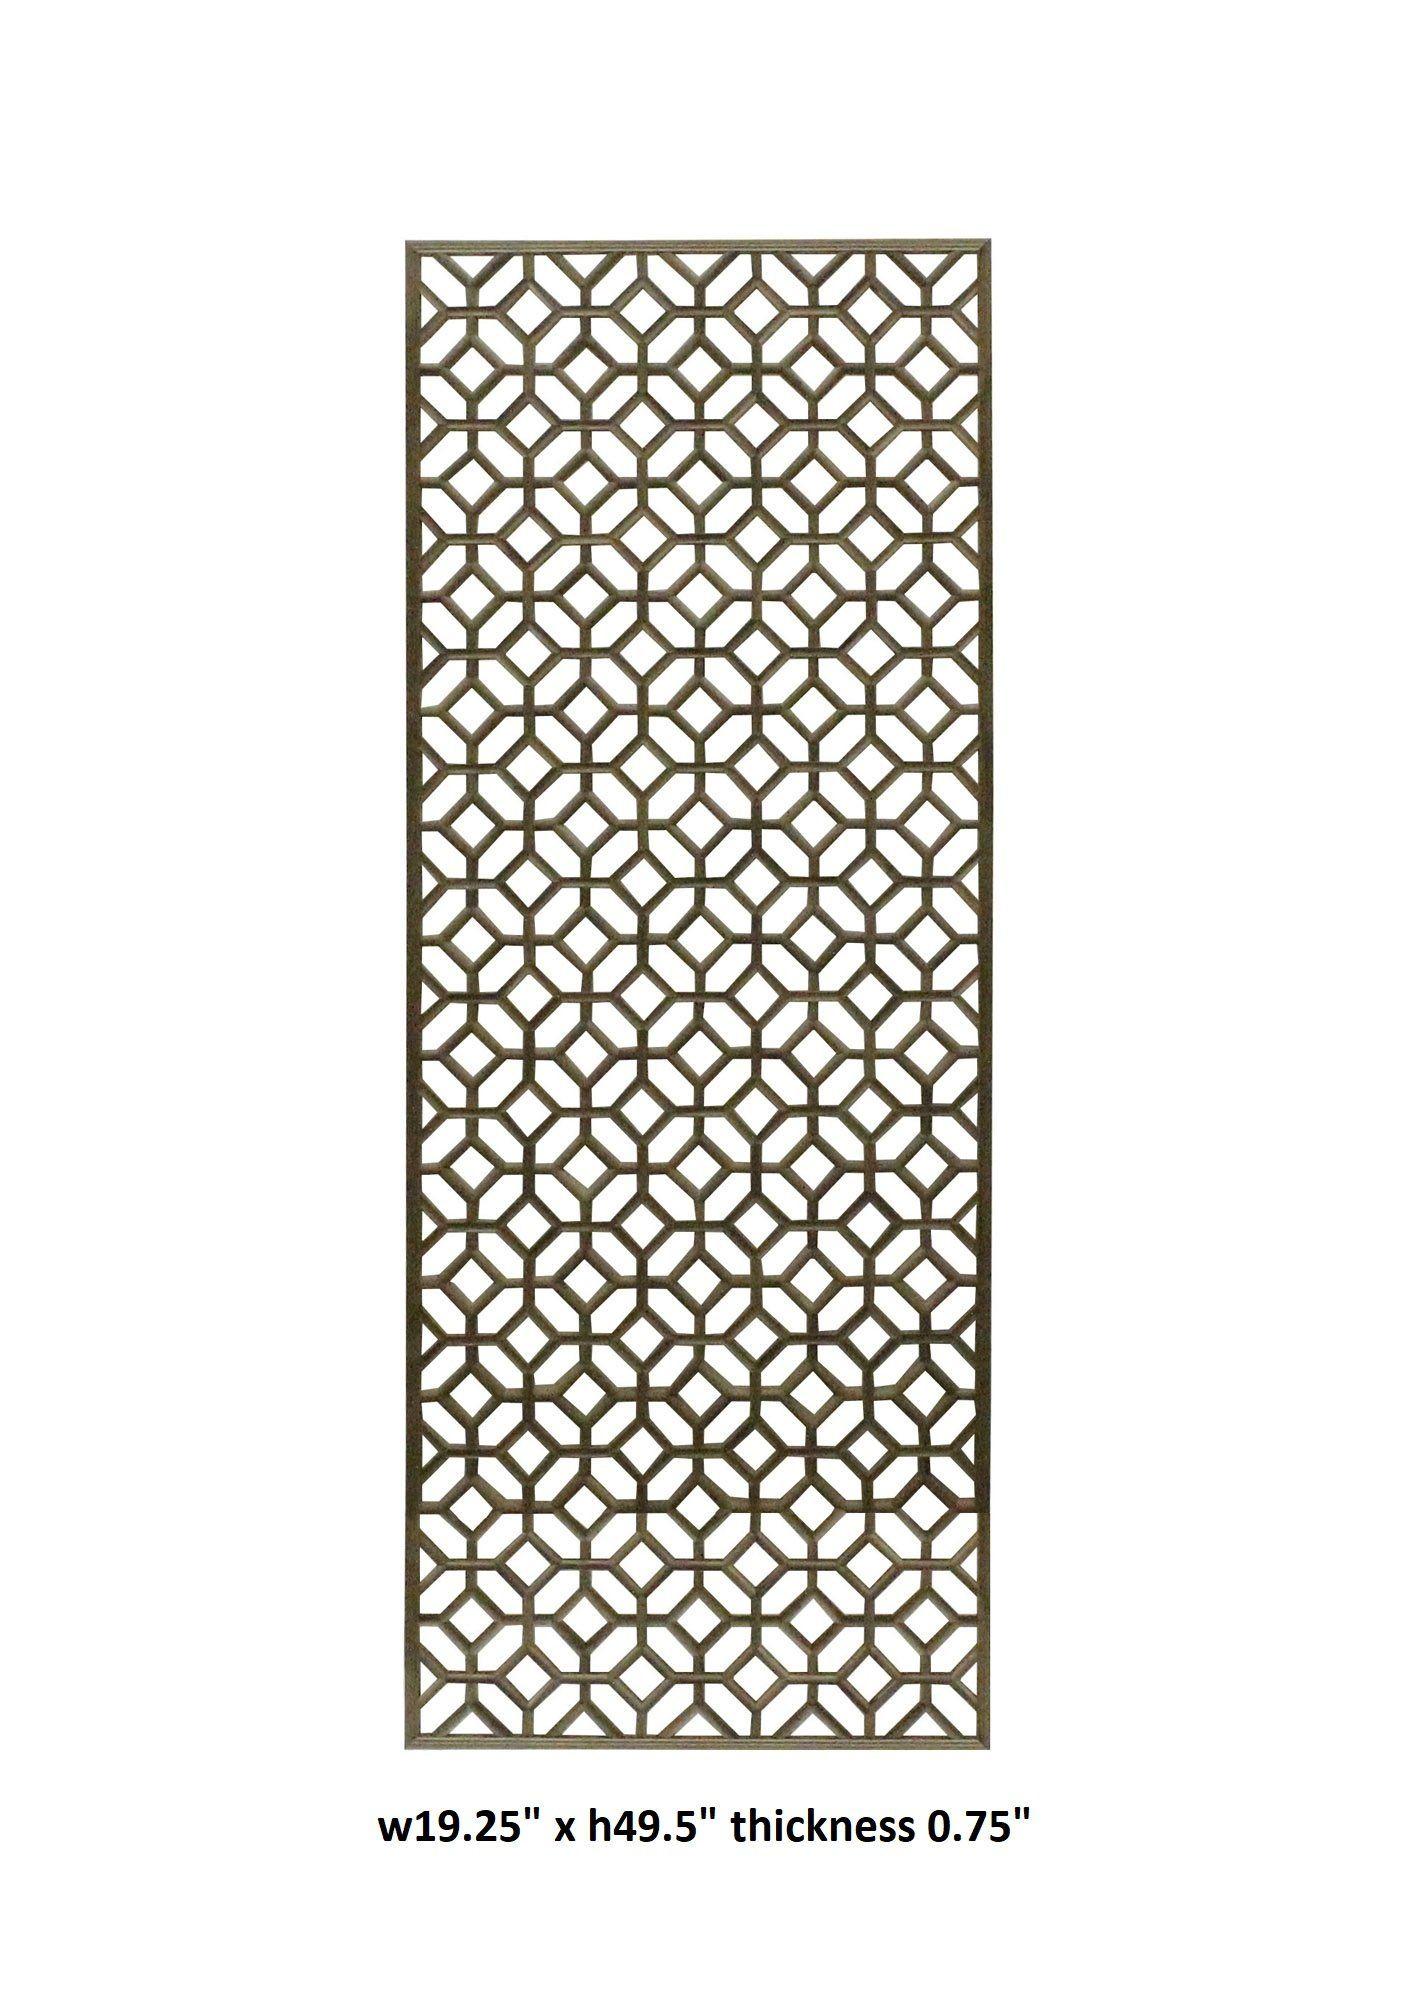 Rectangular Plain Wood Geometric Pattern Wall Panel Cs3746e Etsy Geometric Pattern Wall Patterns Wall Paneling